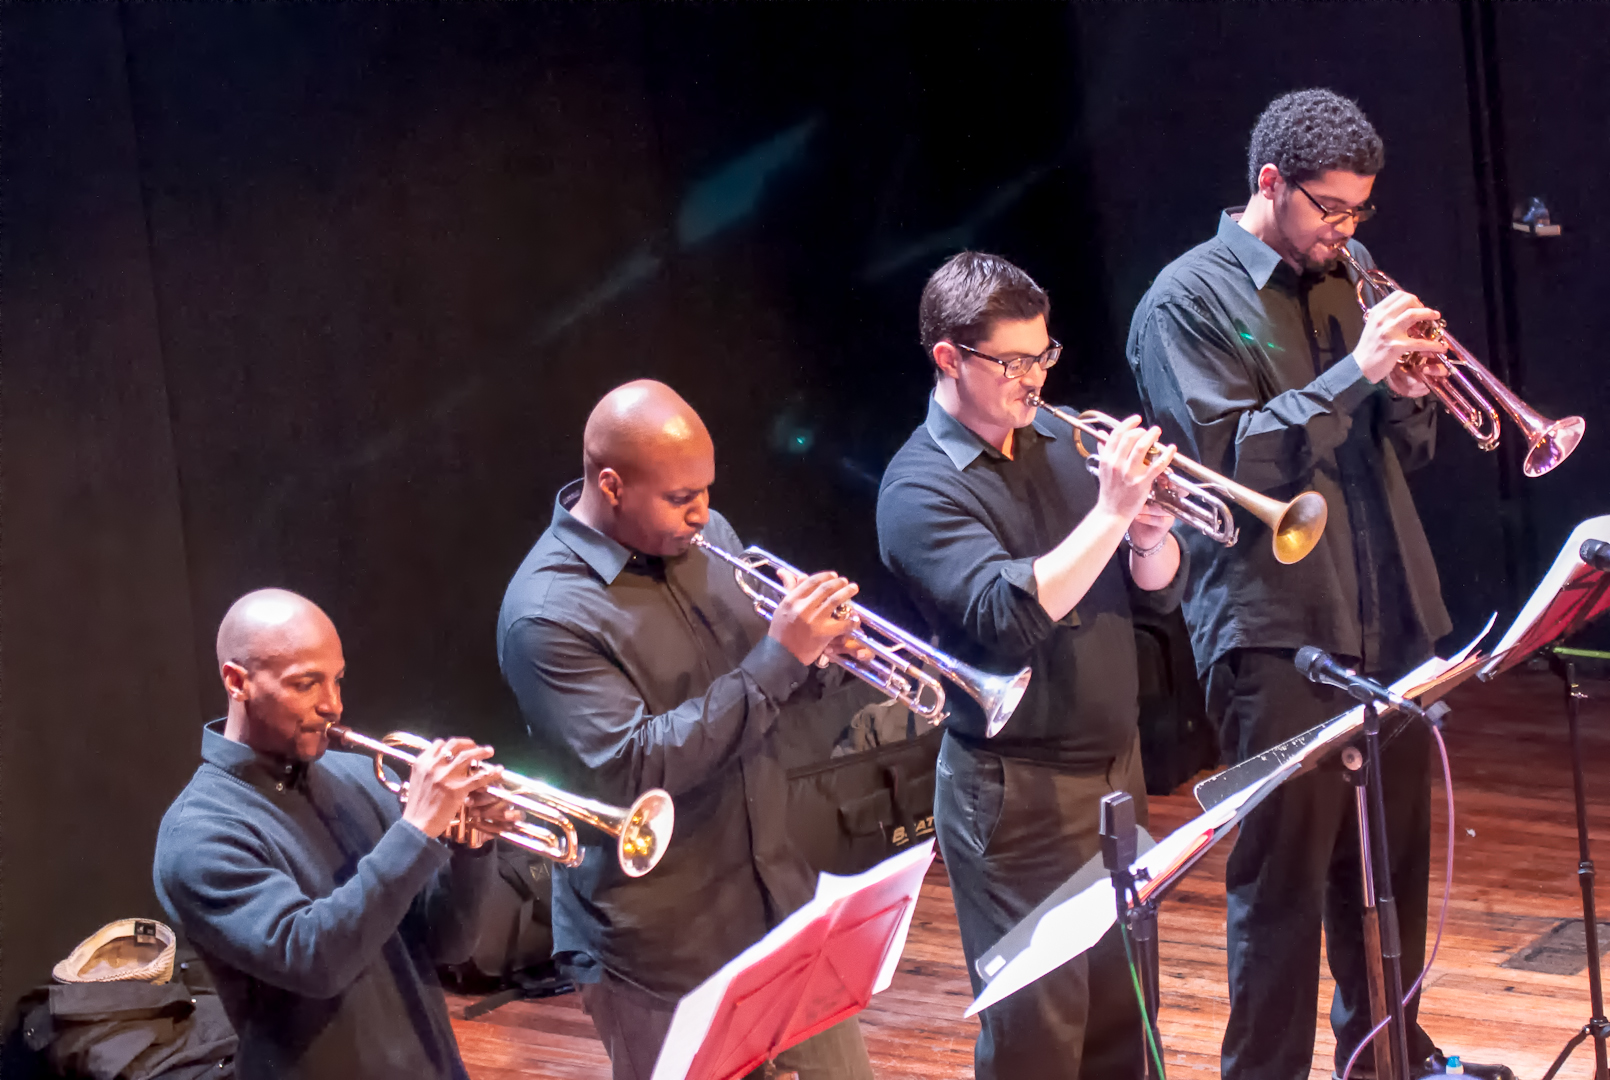 Duane Eubanks, Brian Kilpatrick, Tatum Greenblatt and Josh Evans with the Oliver Lake Big Band at Roulette